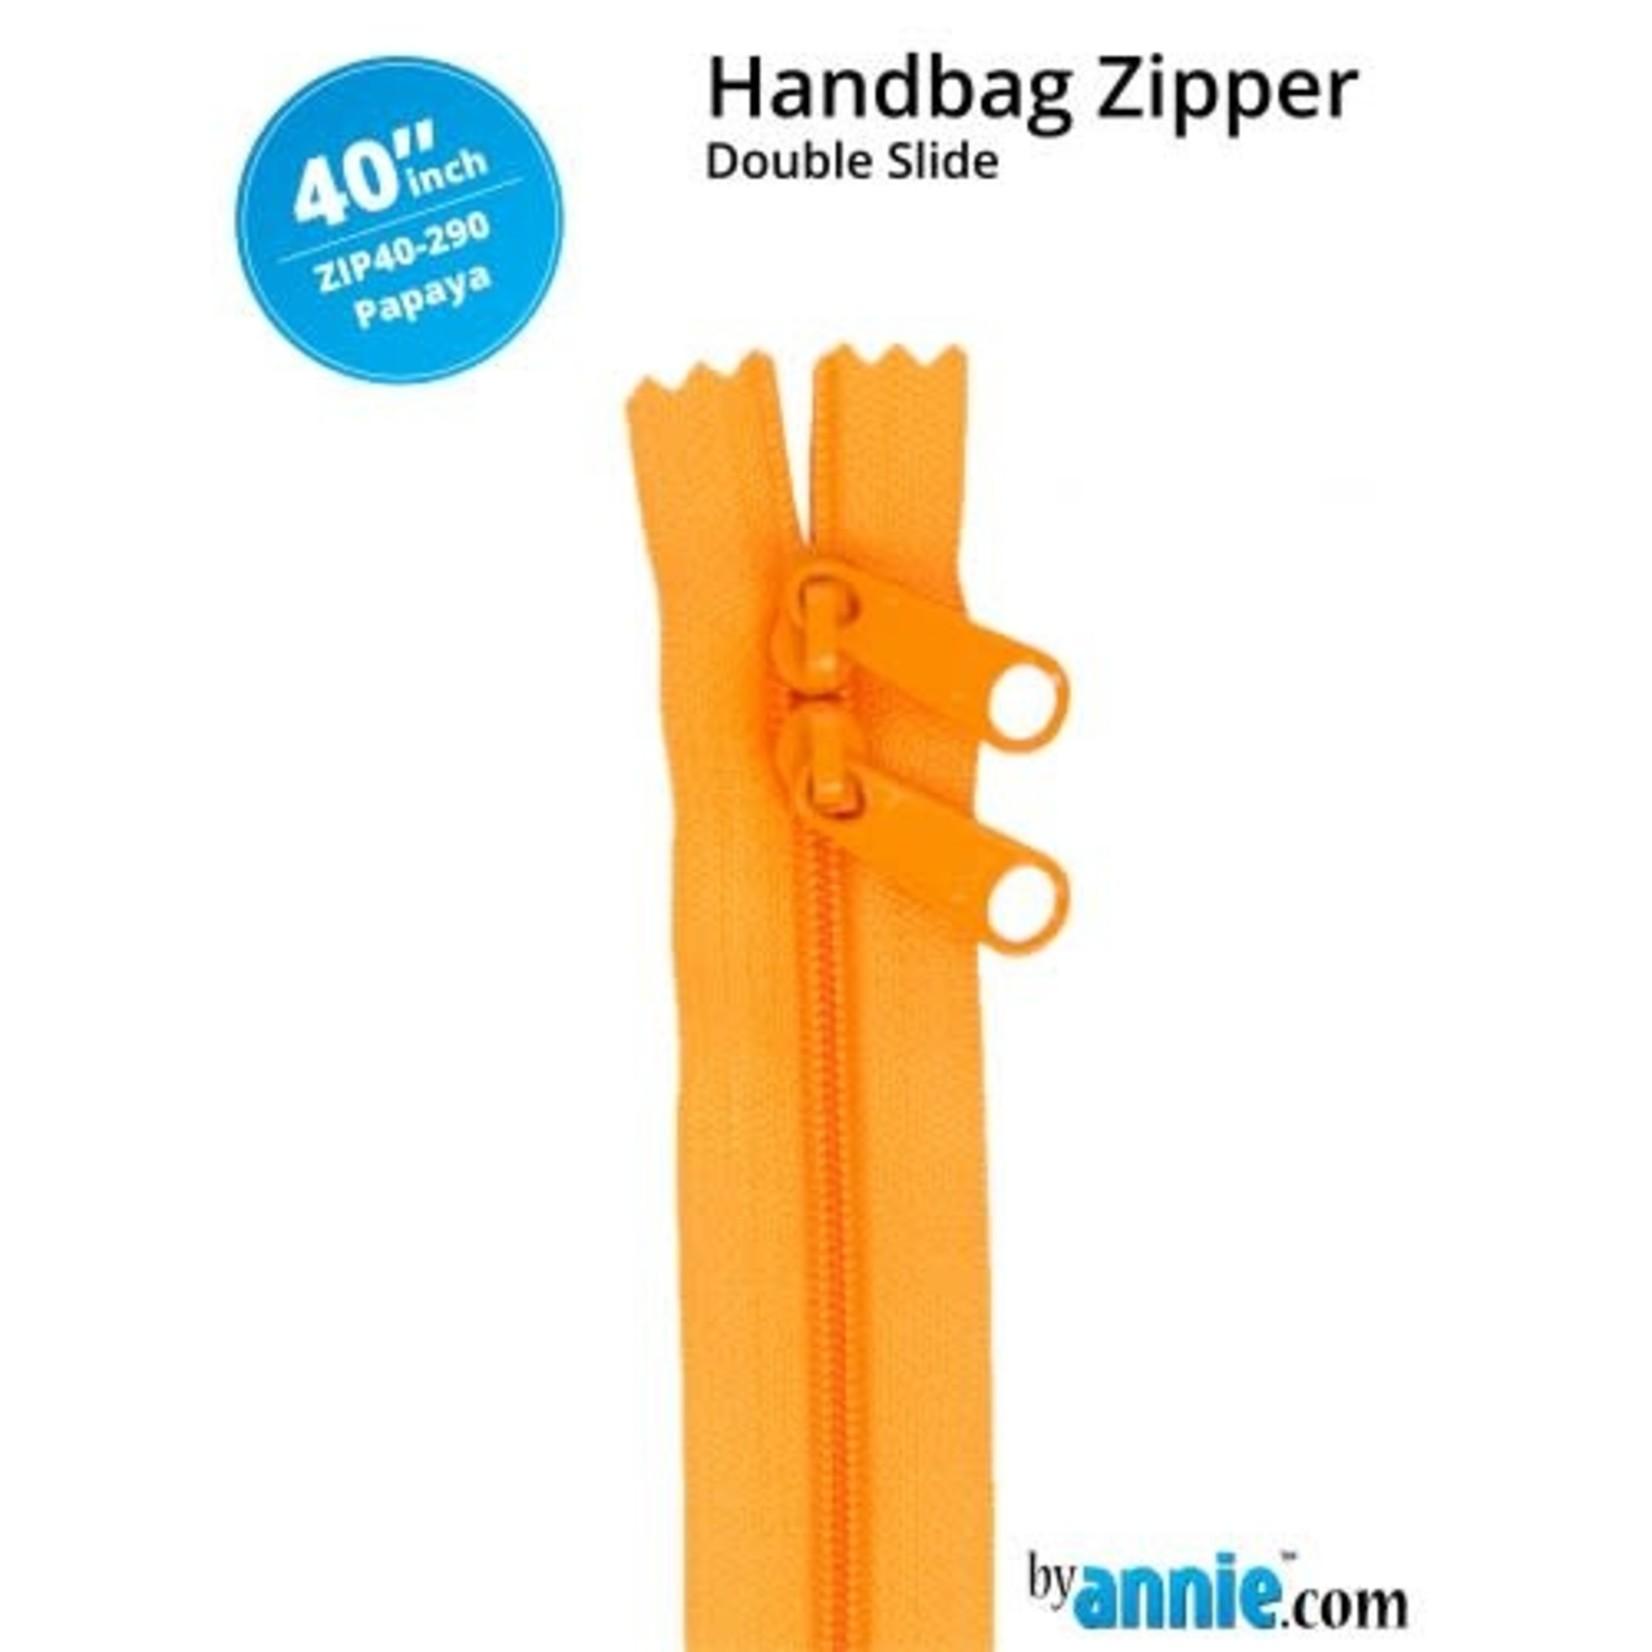 "By Annie Double Slide Handbag Zipper 40"" Yellow/Orange"